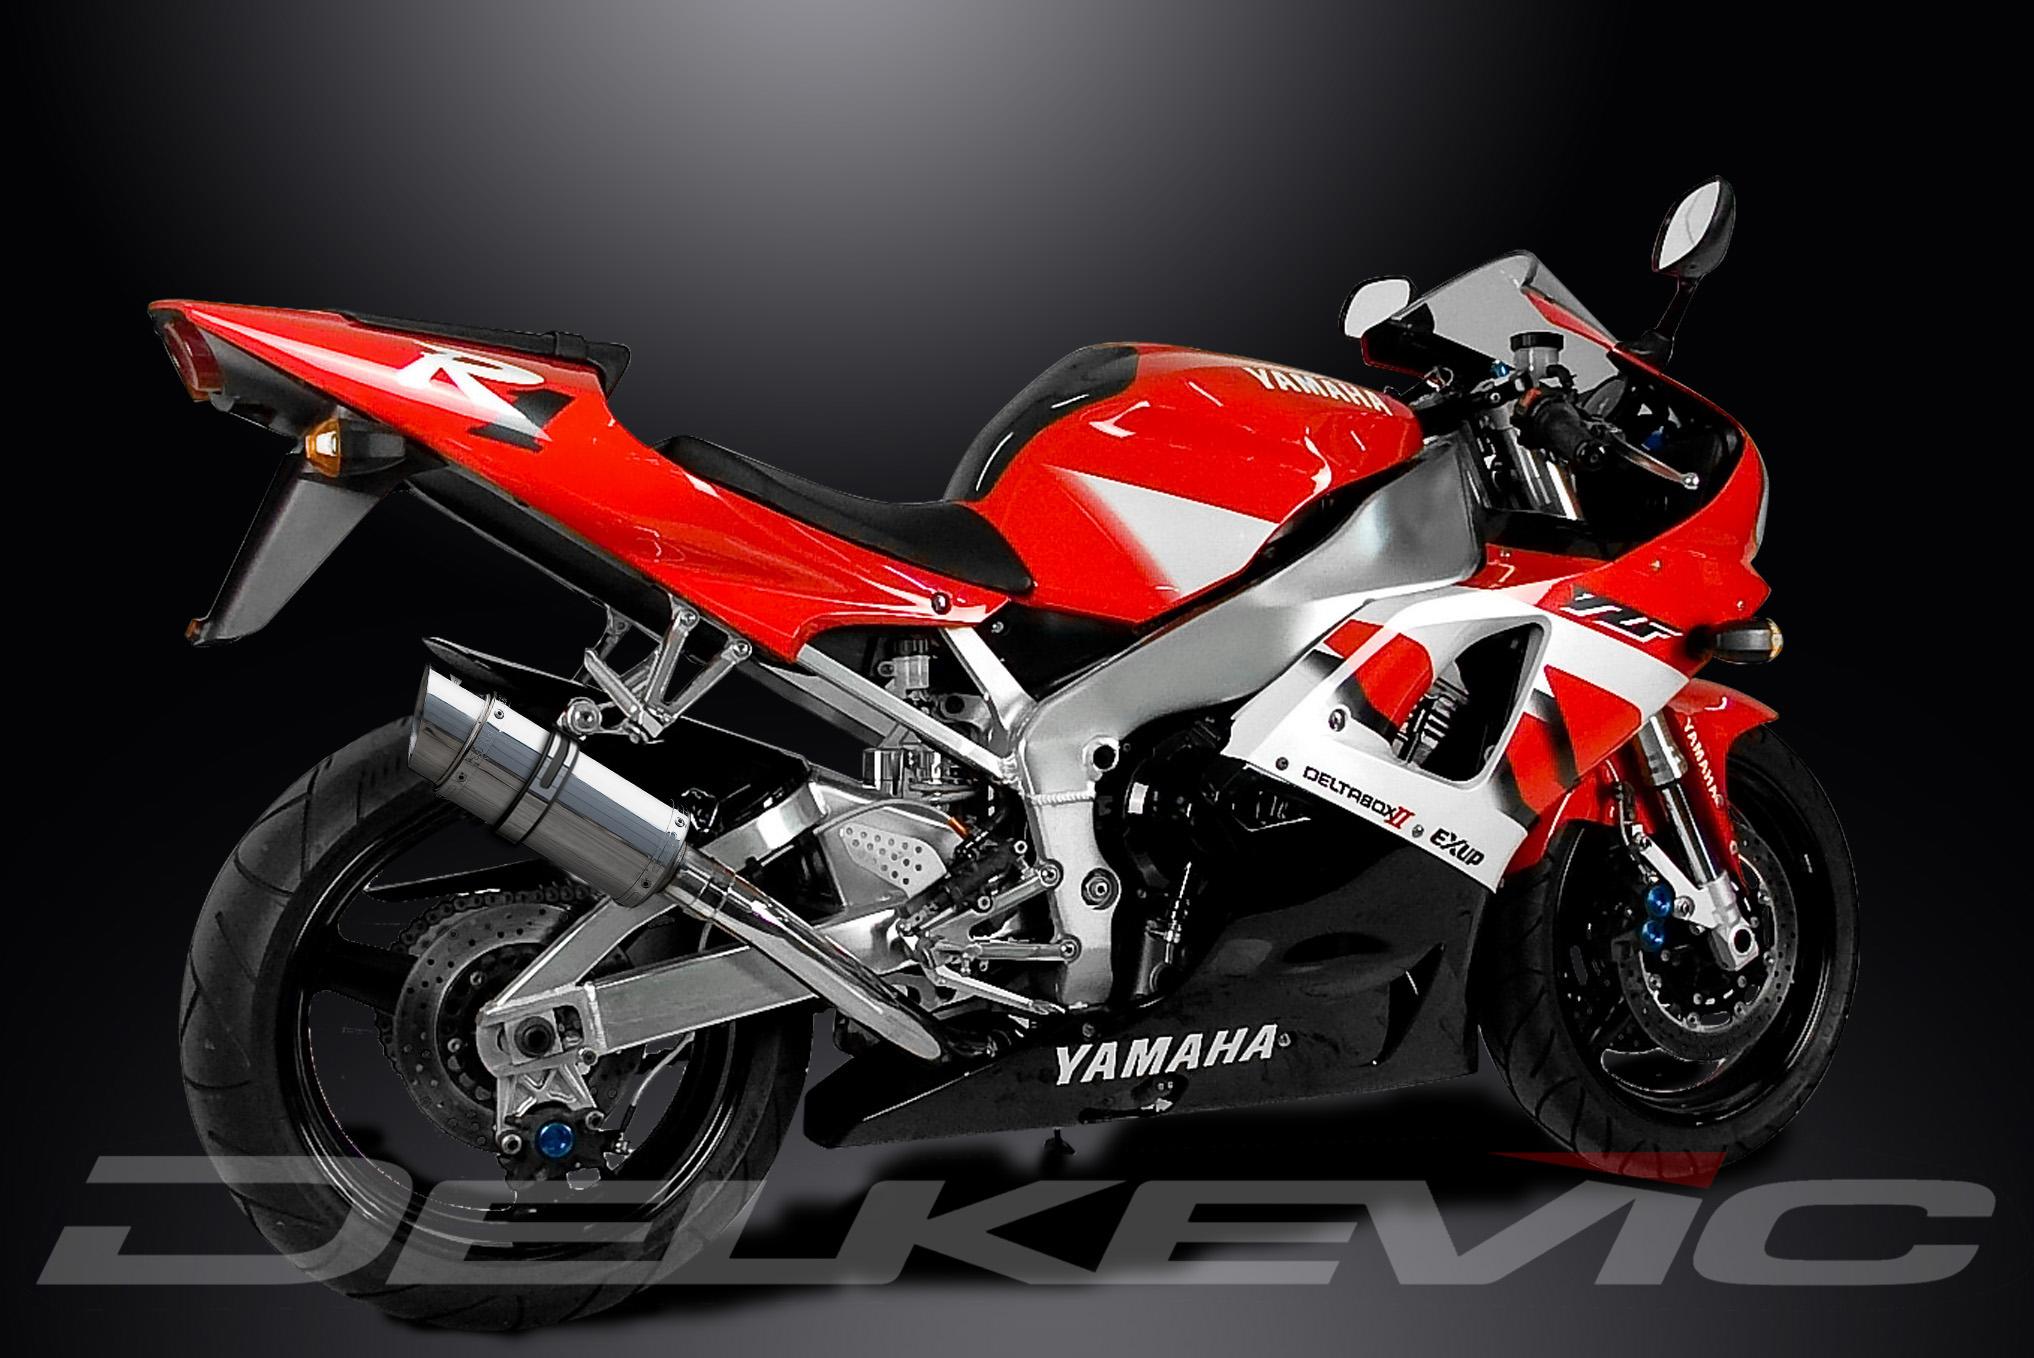 Yamaha r1 yzf r1 yzfr1 4xv 5jj 98 01 round mini 200mm for 01 yamaha r1